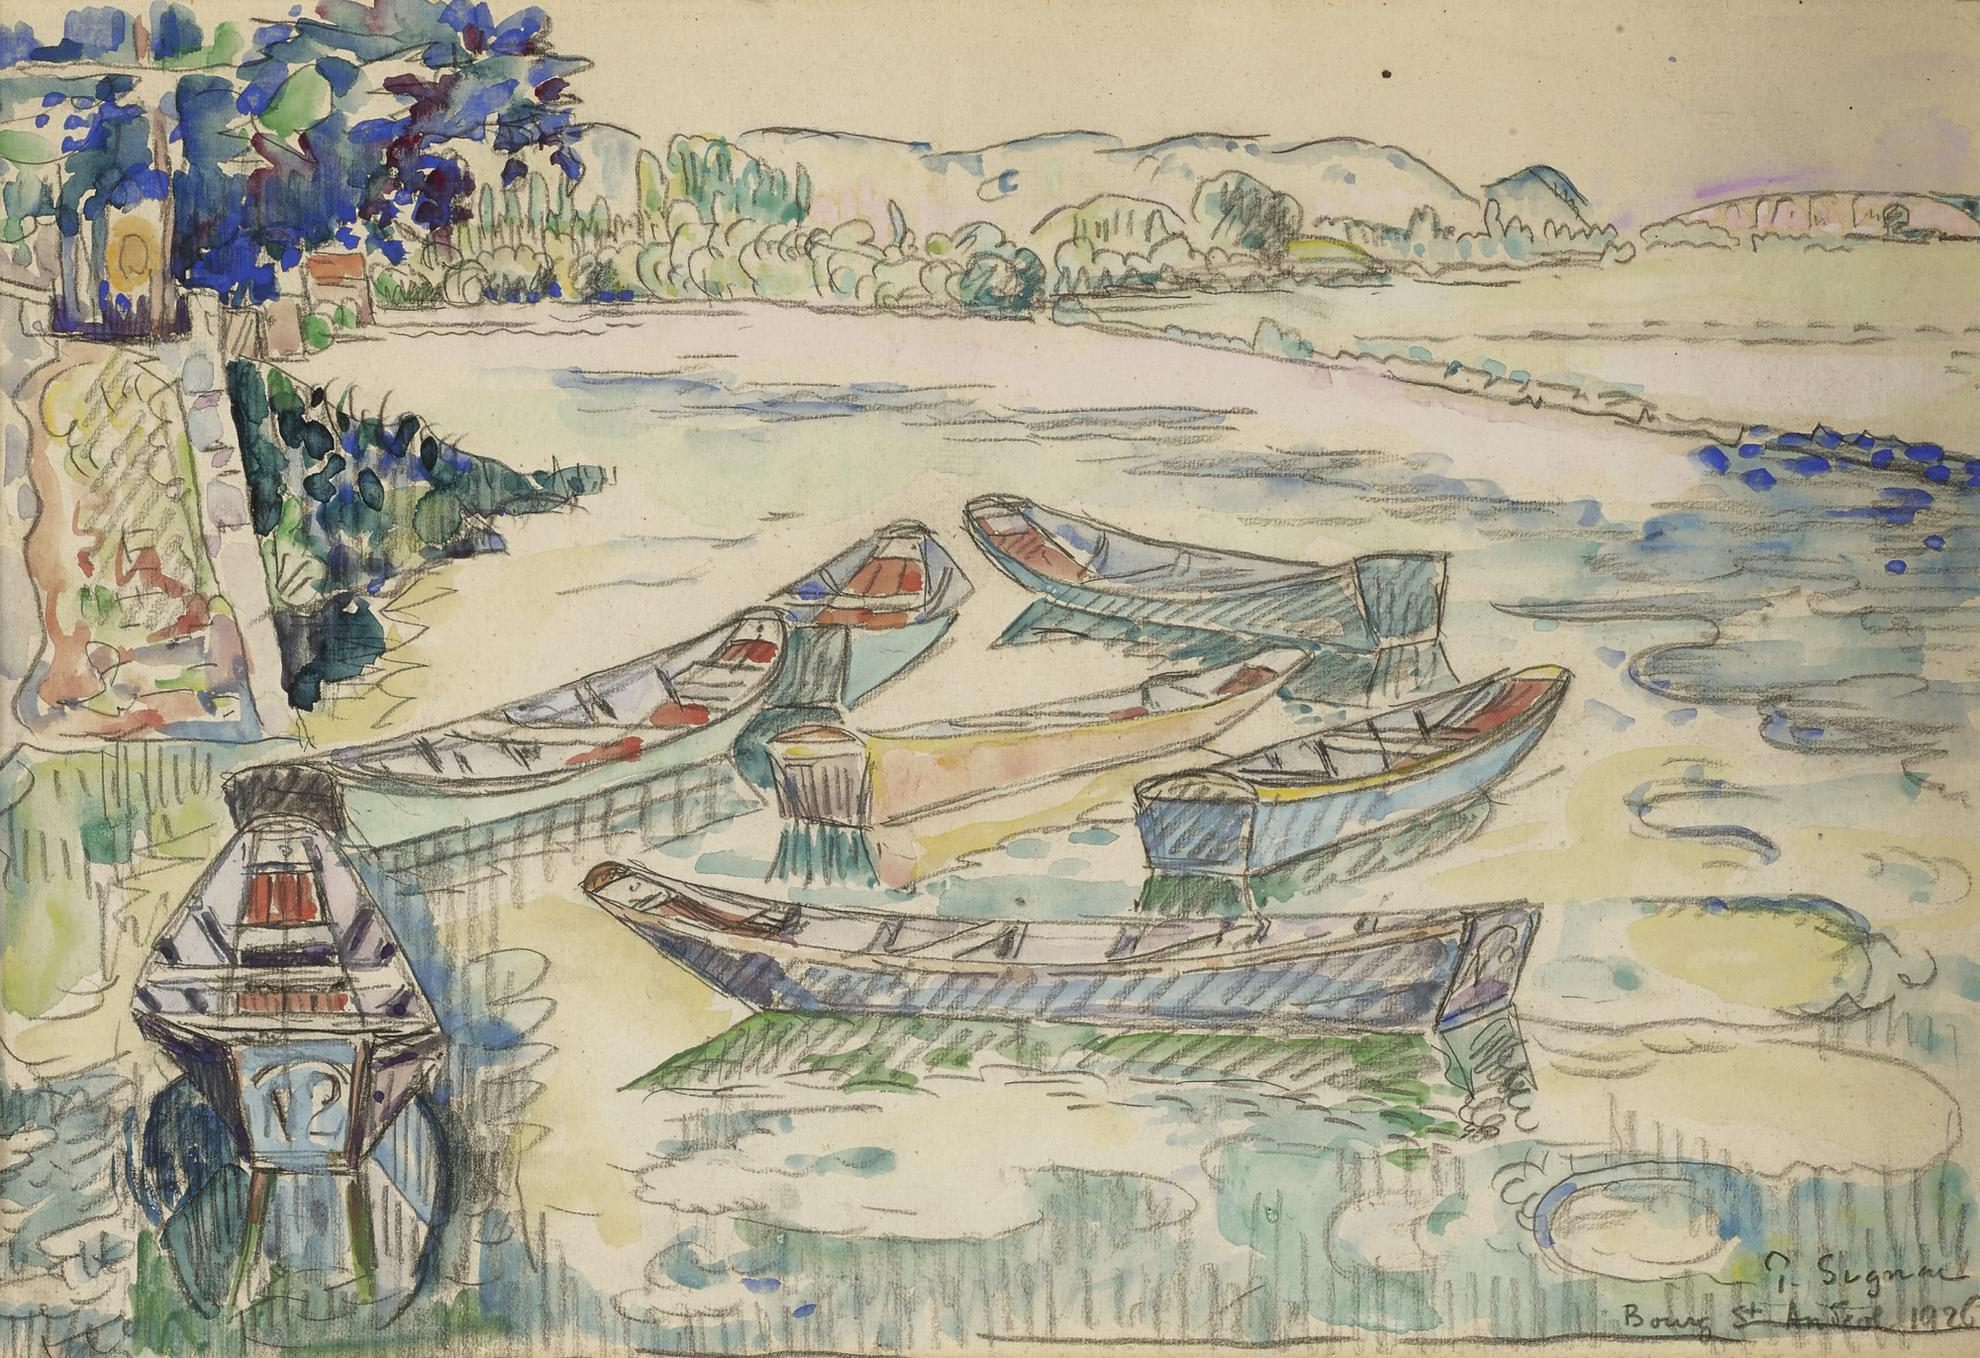 Paul Signac-Bourg Saint-Andeol-1926